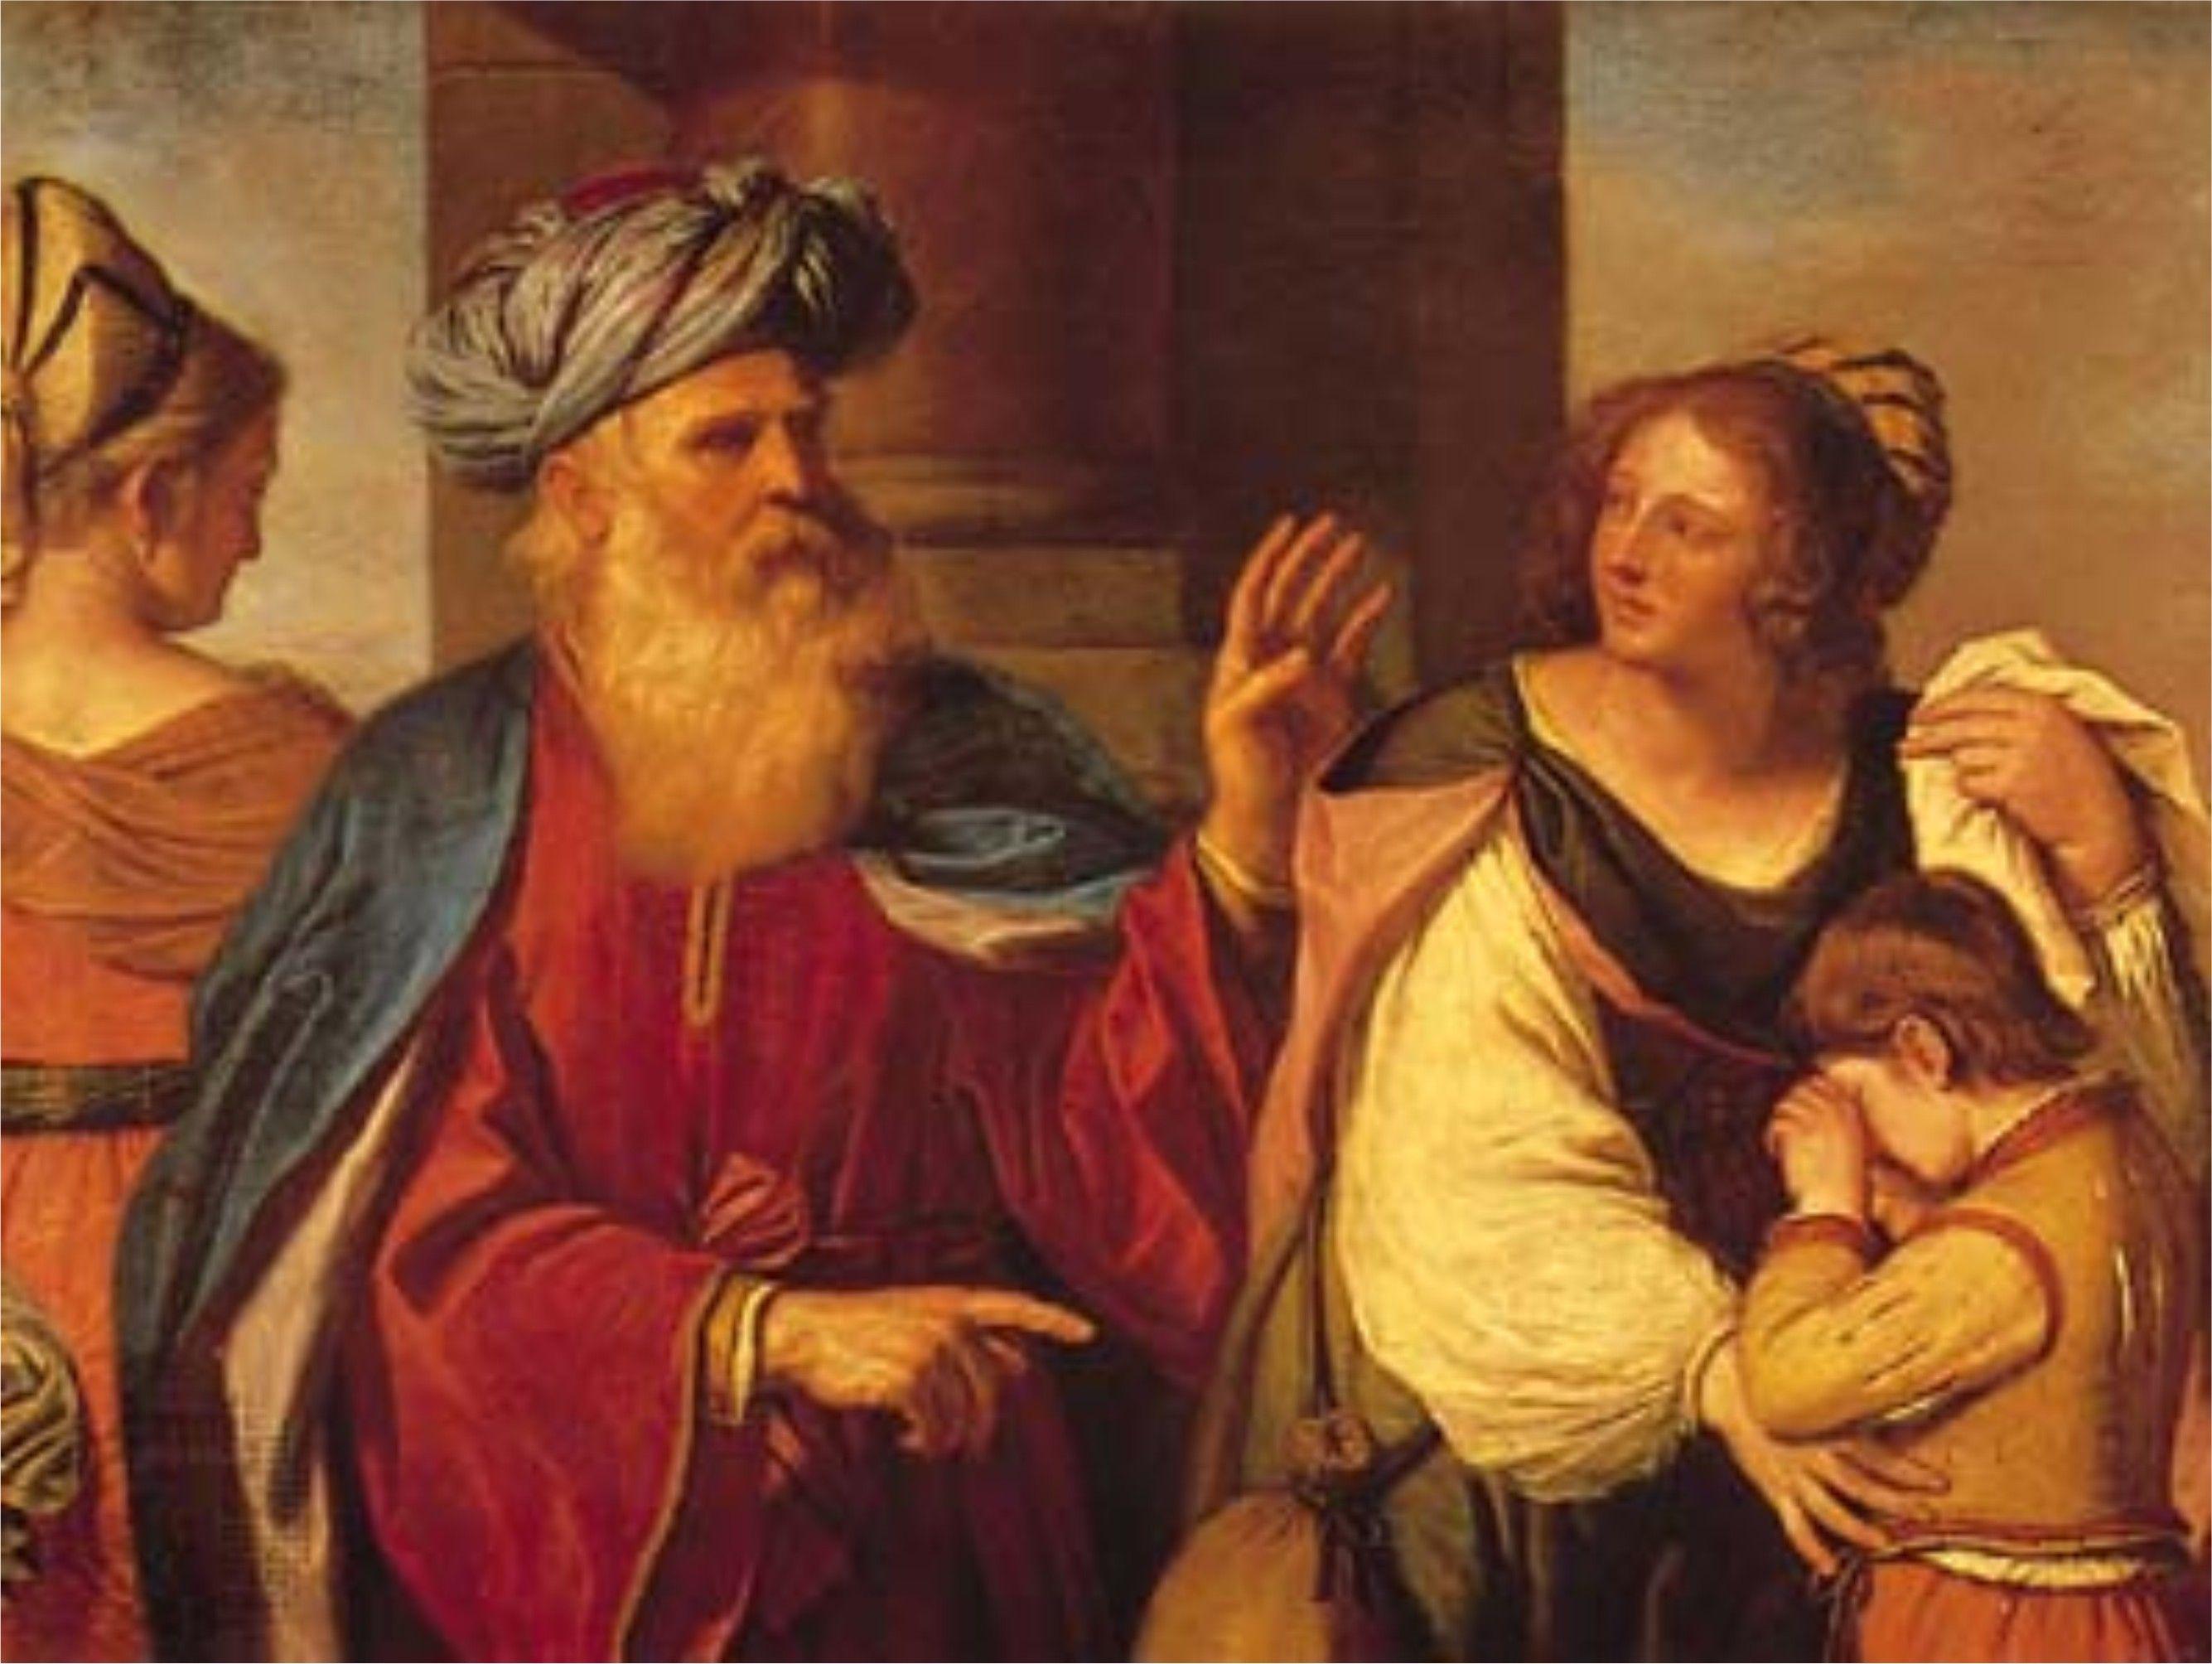 abraham driving agar & ismael | bible characters | Pinterest | Agar